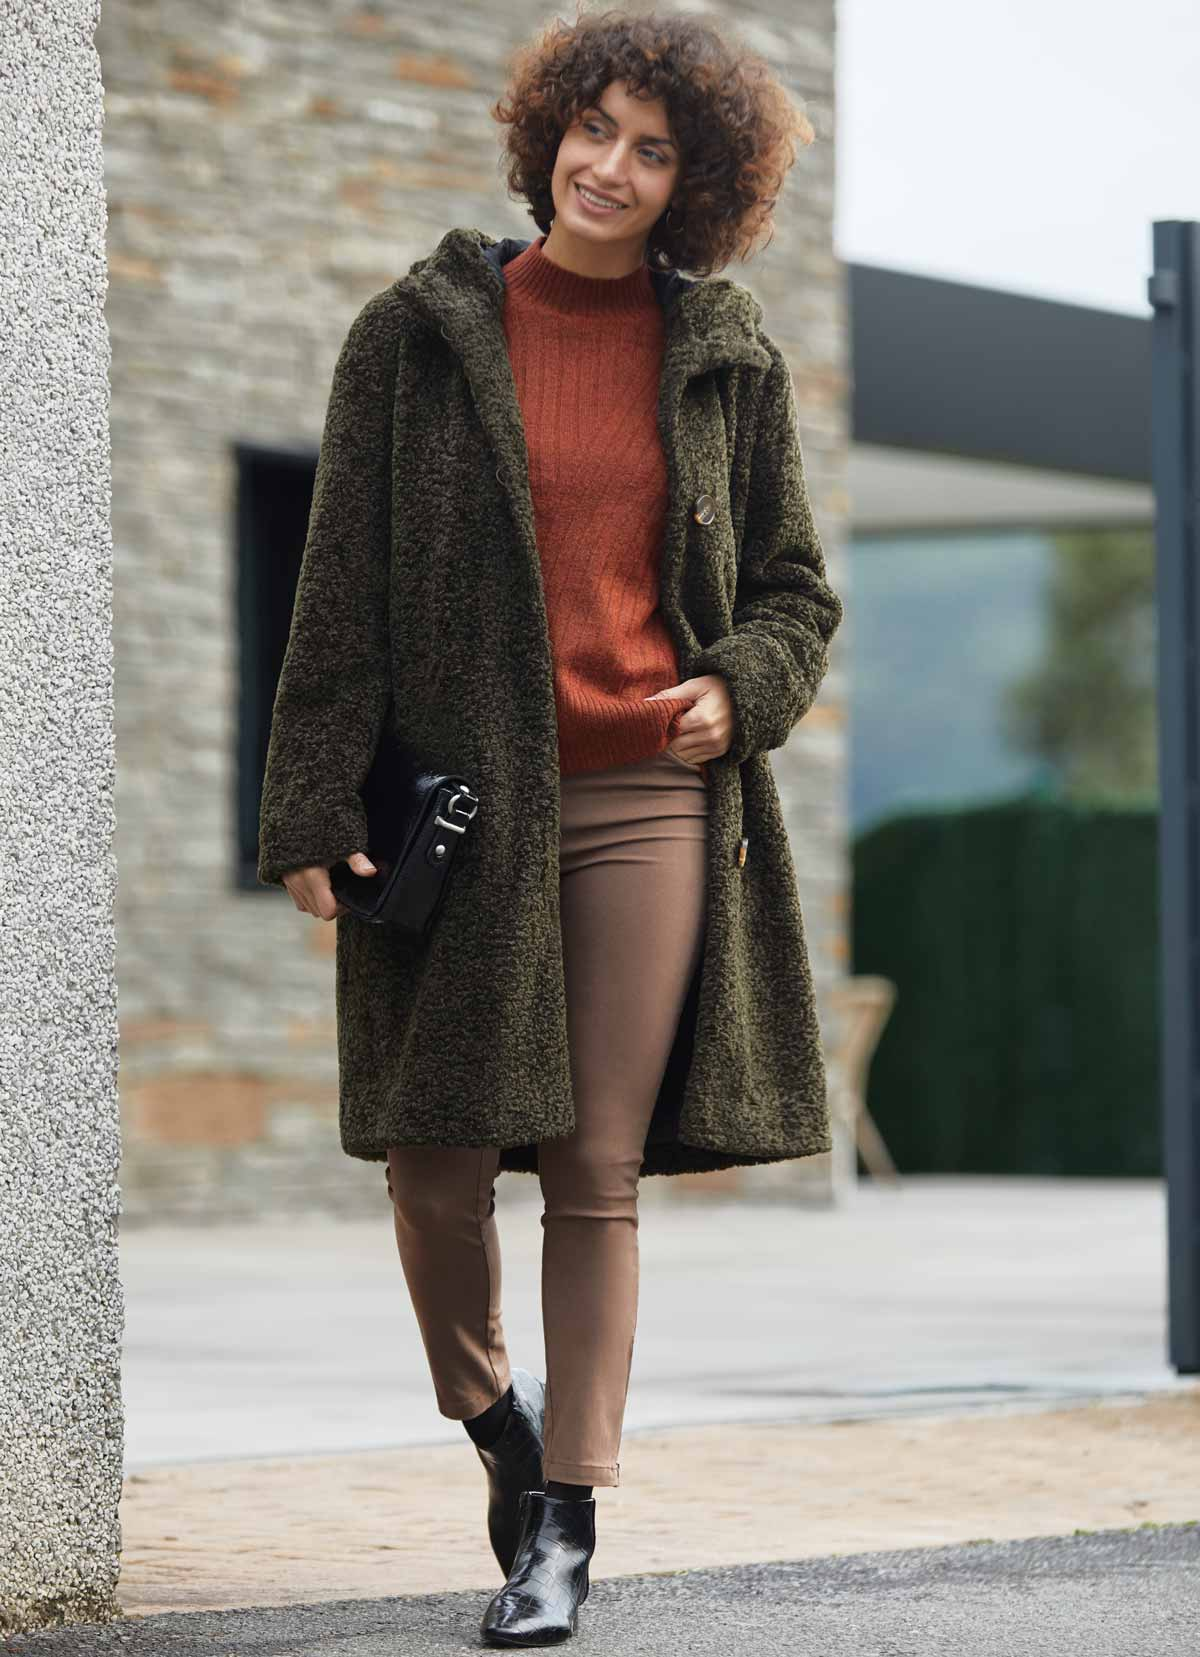 Manteau teddy kaki et capuche tenue